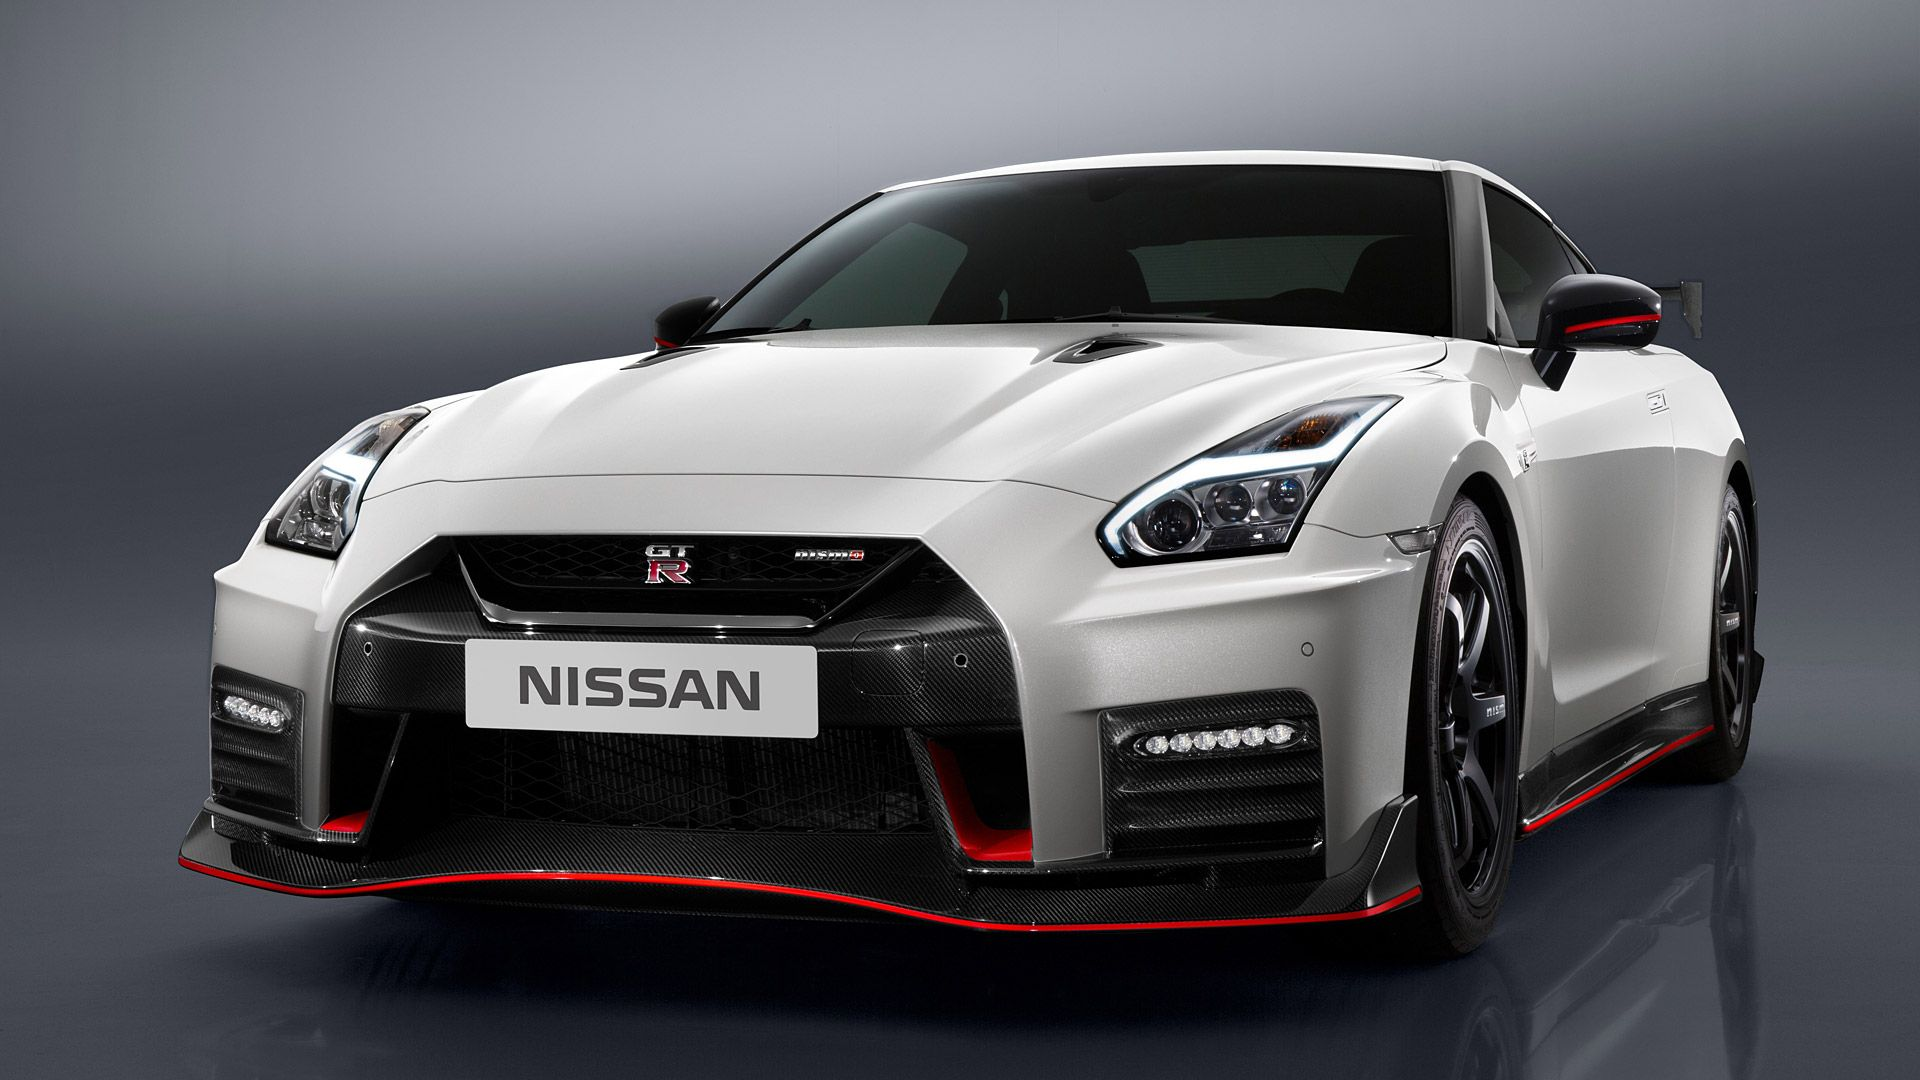 2017 Nissan Gt R Nismo Http Www Wsupercars Com Nissan 2017 Gtr Nismo Php Nissan Gtr Nismo Nissan Gtr R35 Gtr Nismo